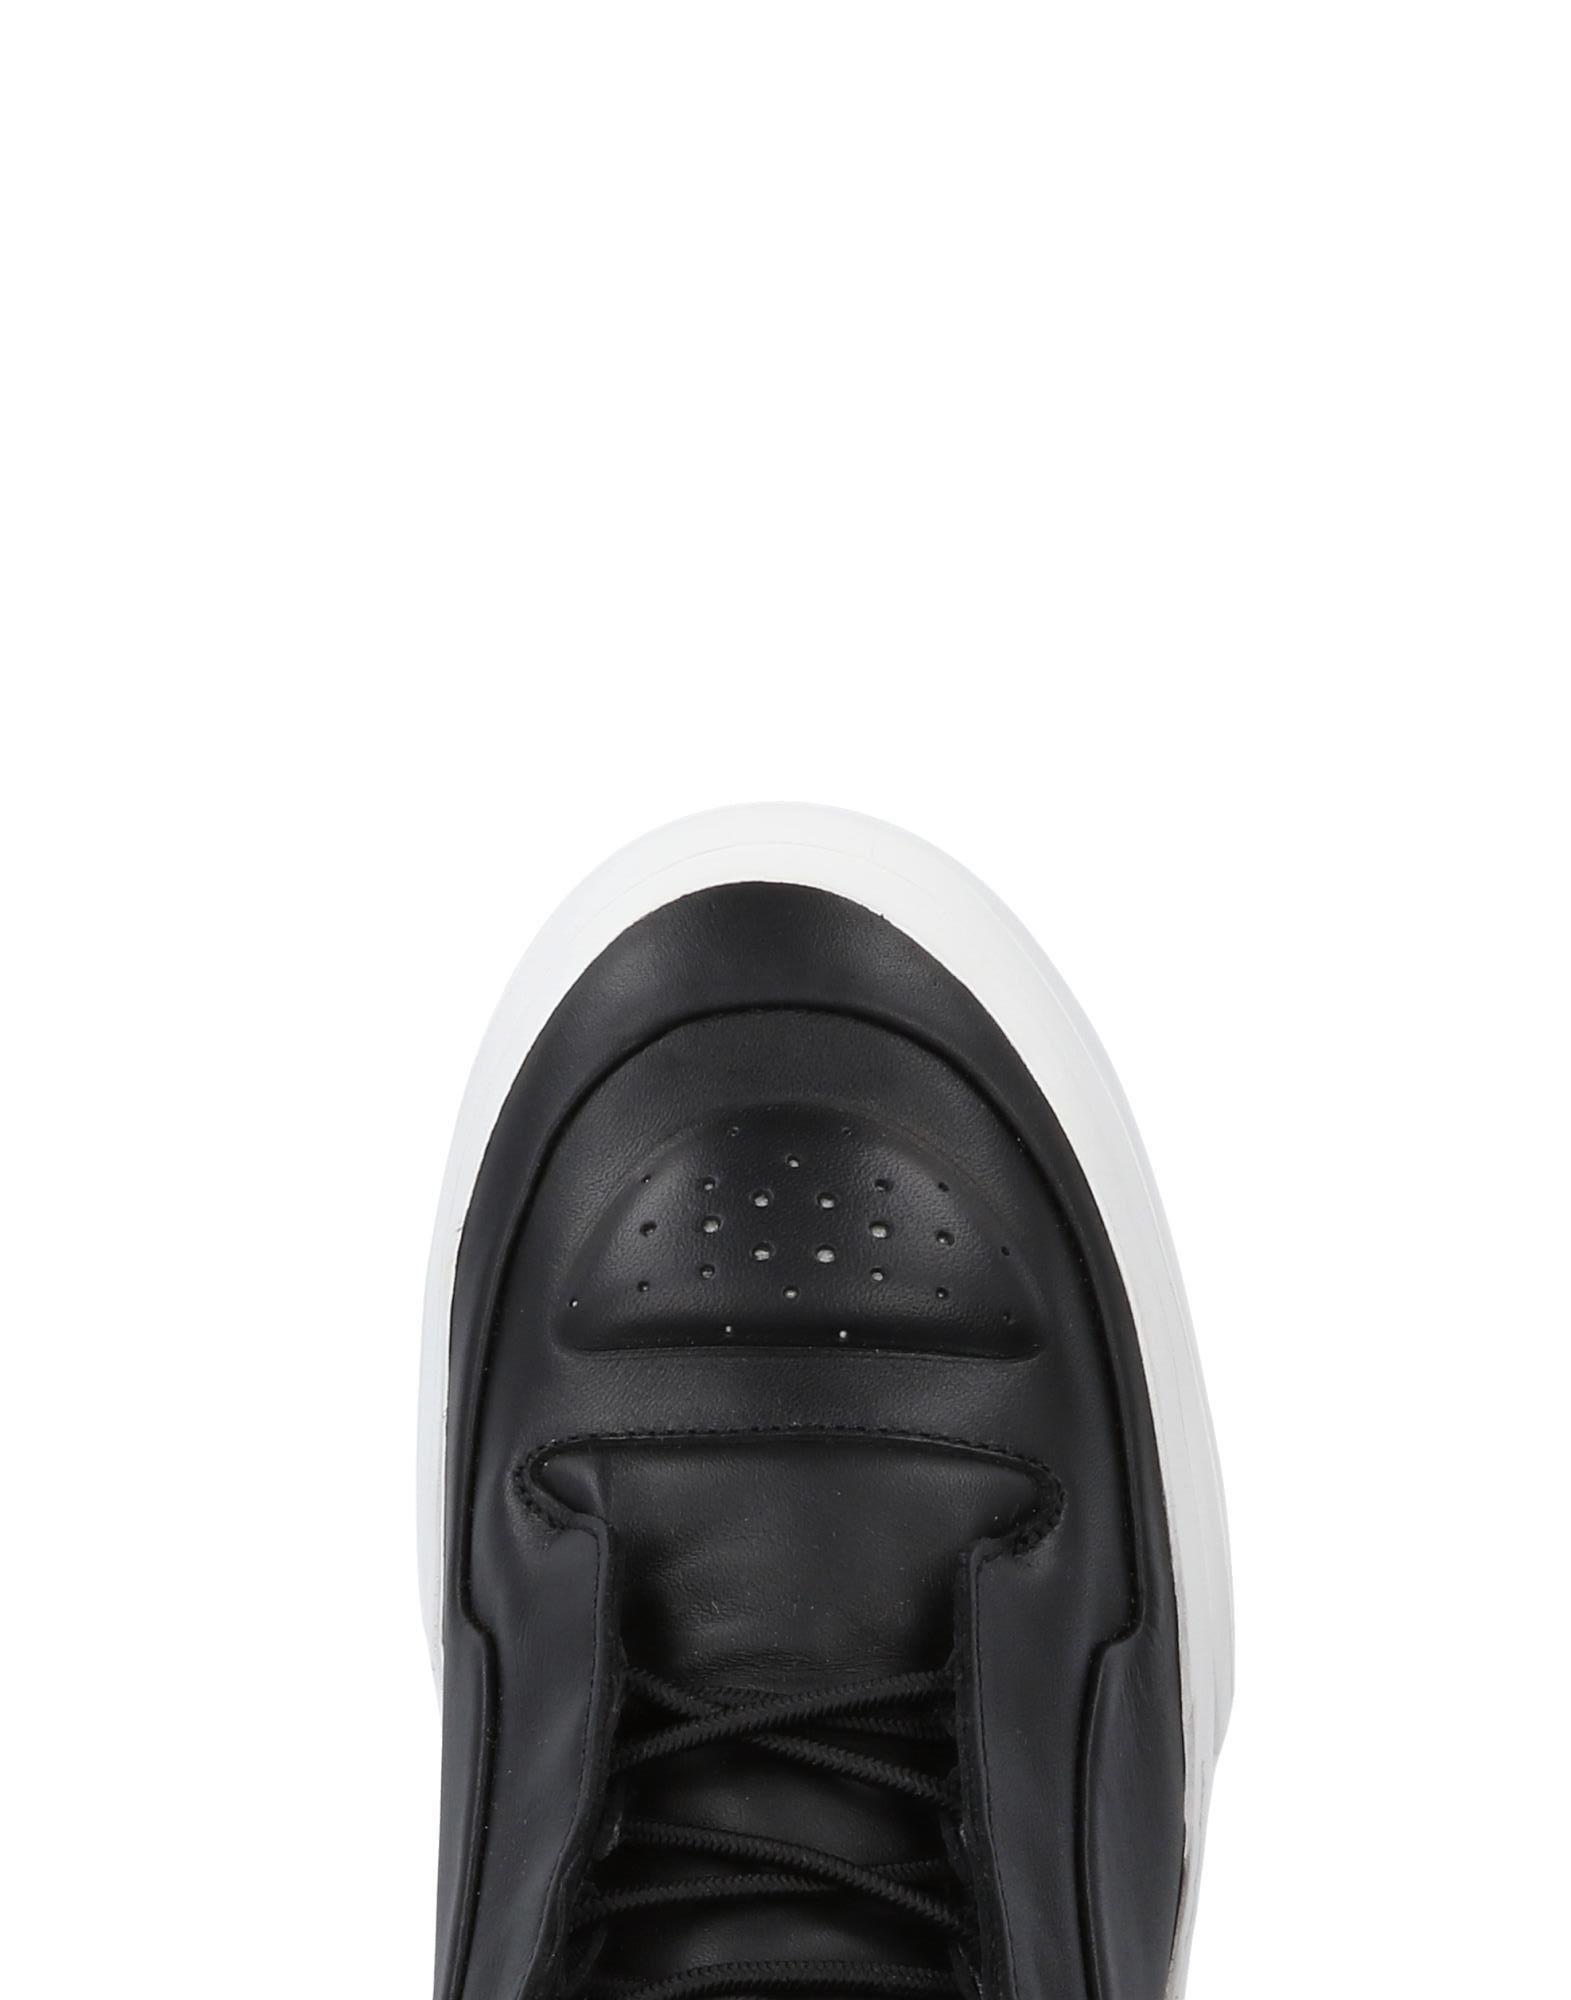 Maison Margiela Sneakers Herren  11471933SR Gute Qualität beliebte Schuhe